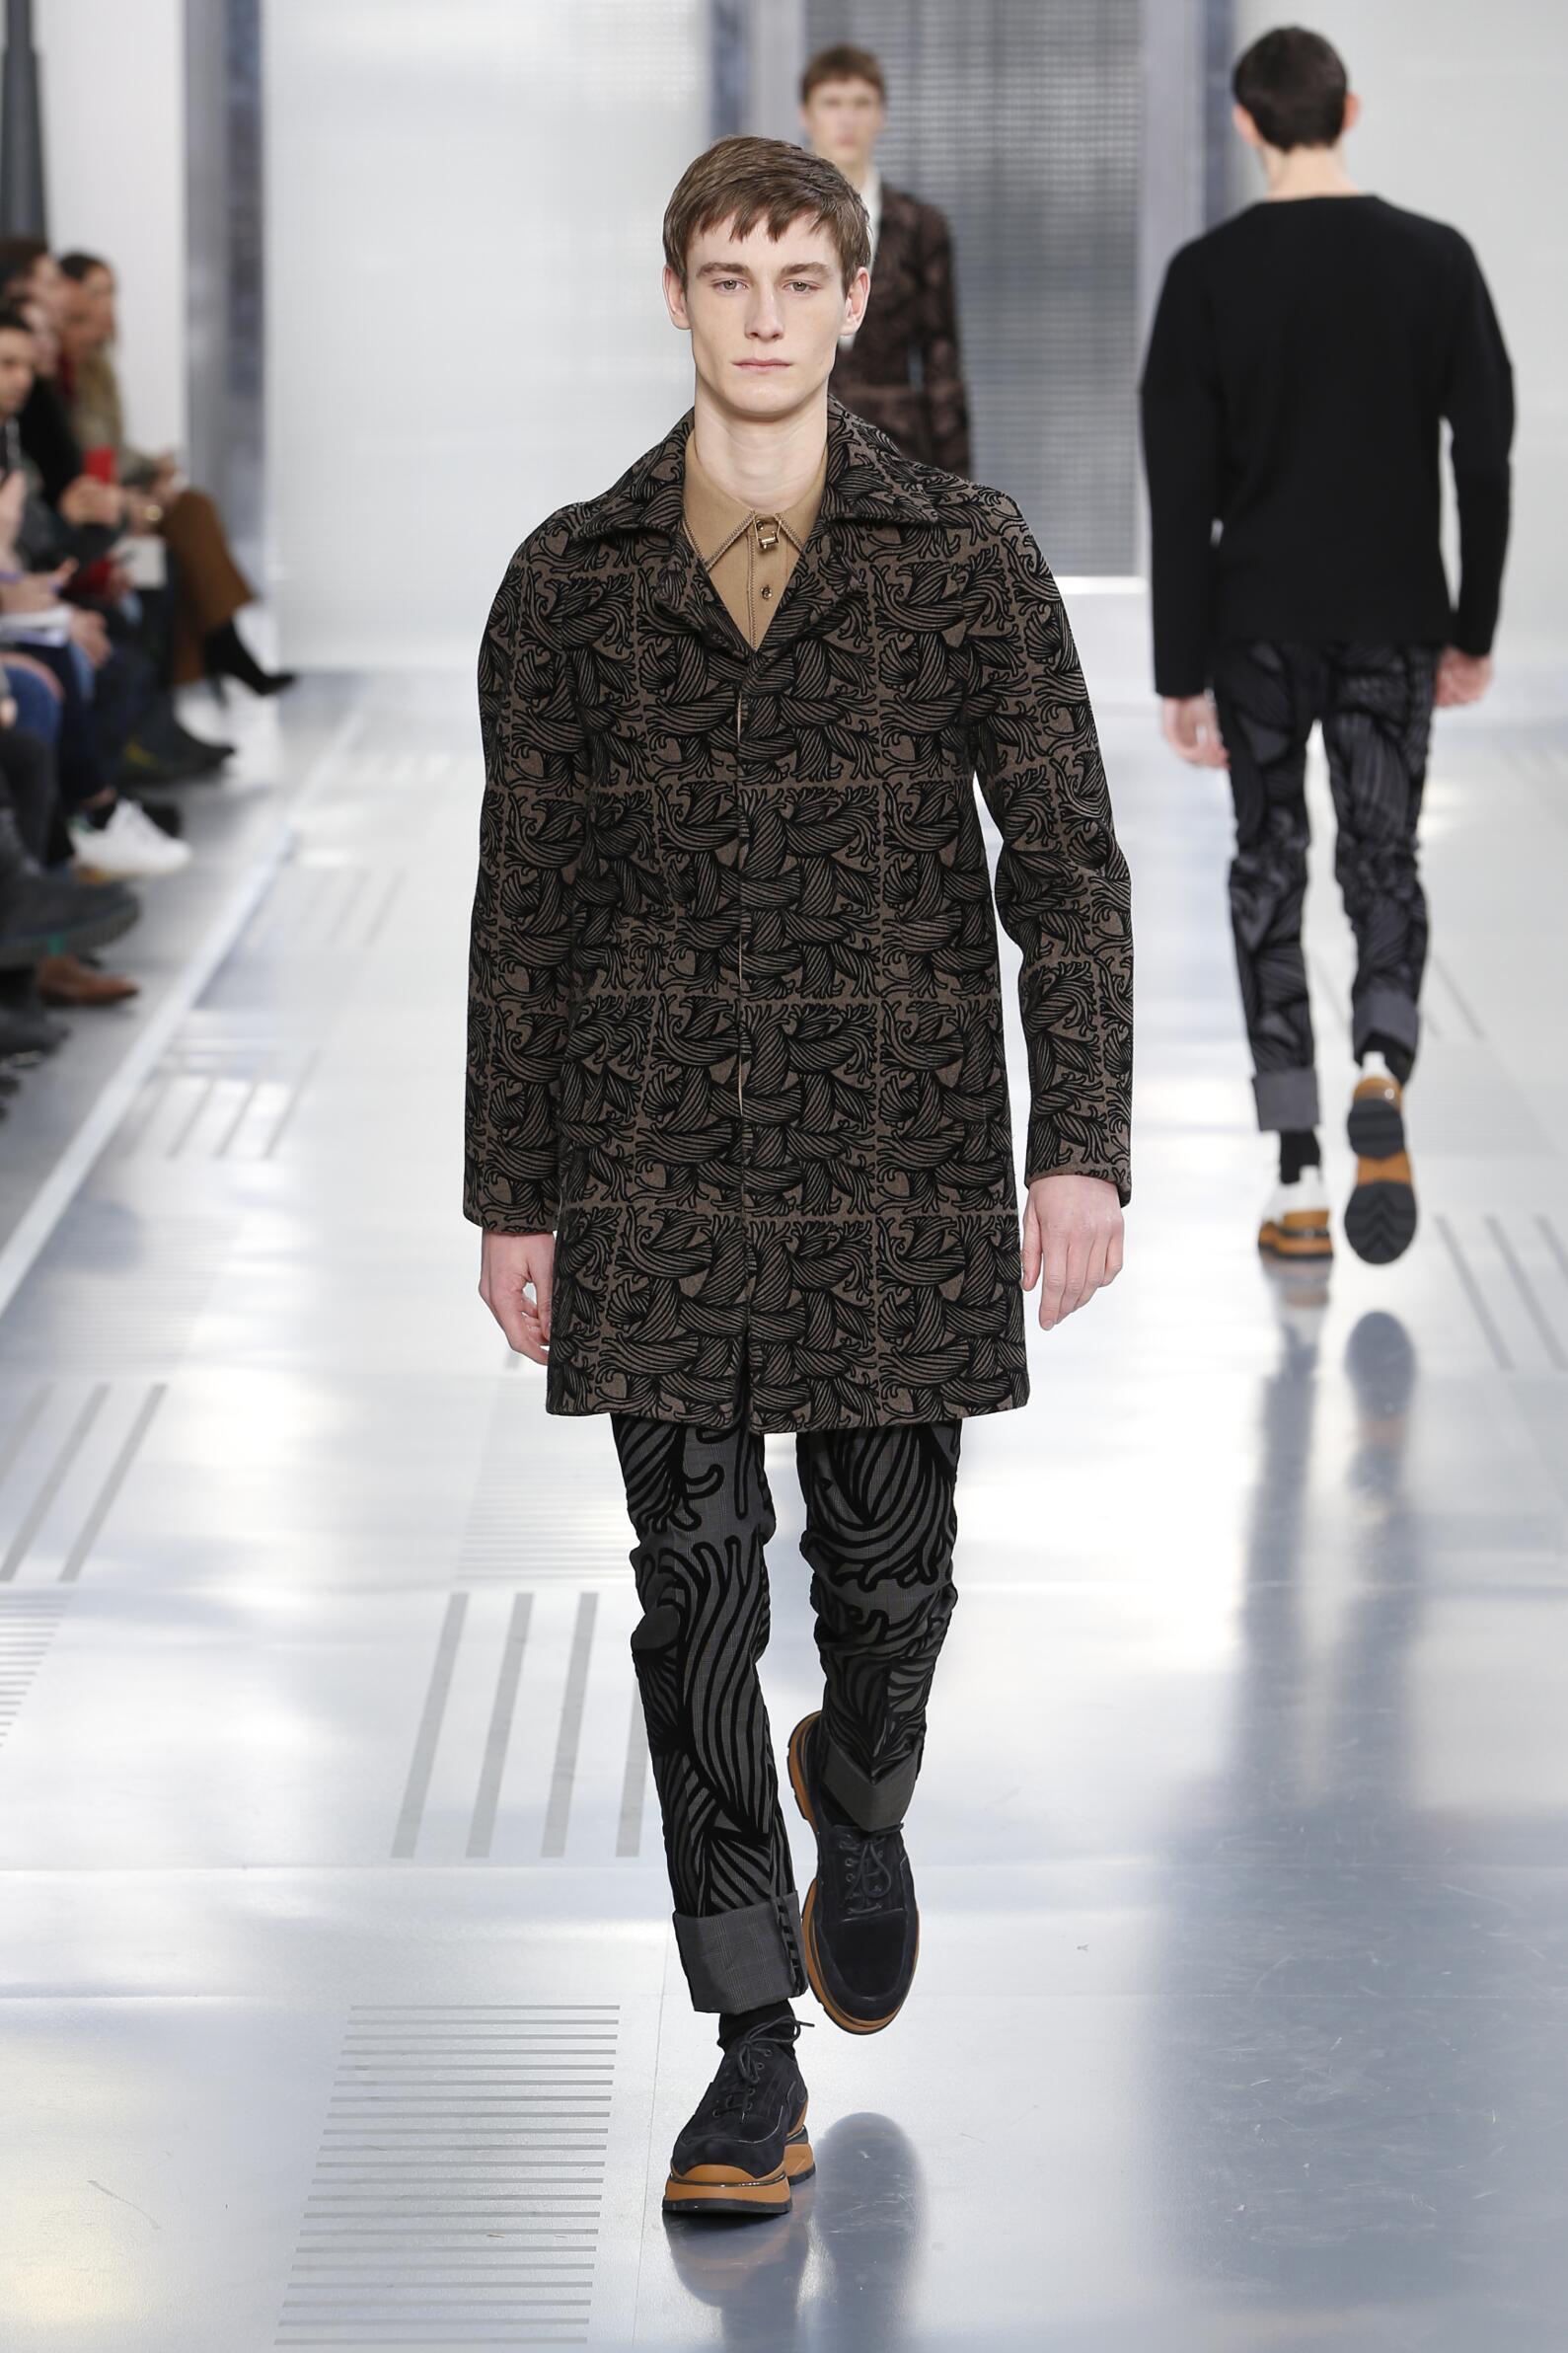 Catwalk Louis Vuitton Collection Fashion Show Winter 2015